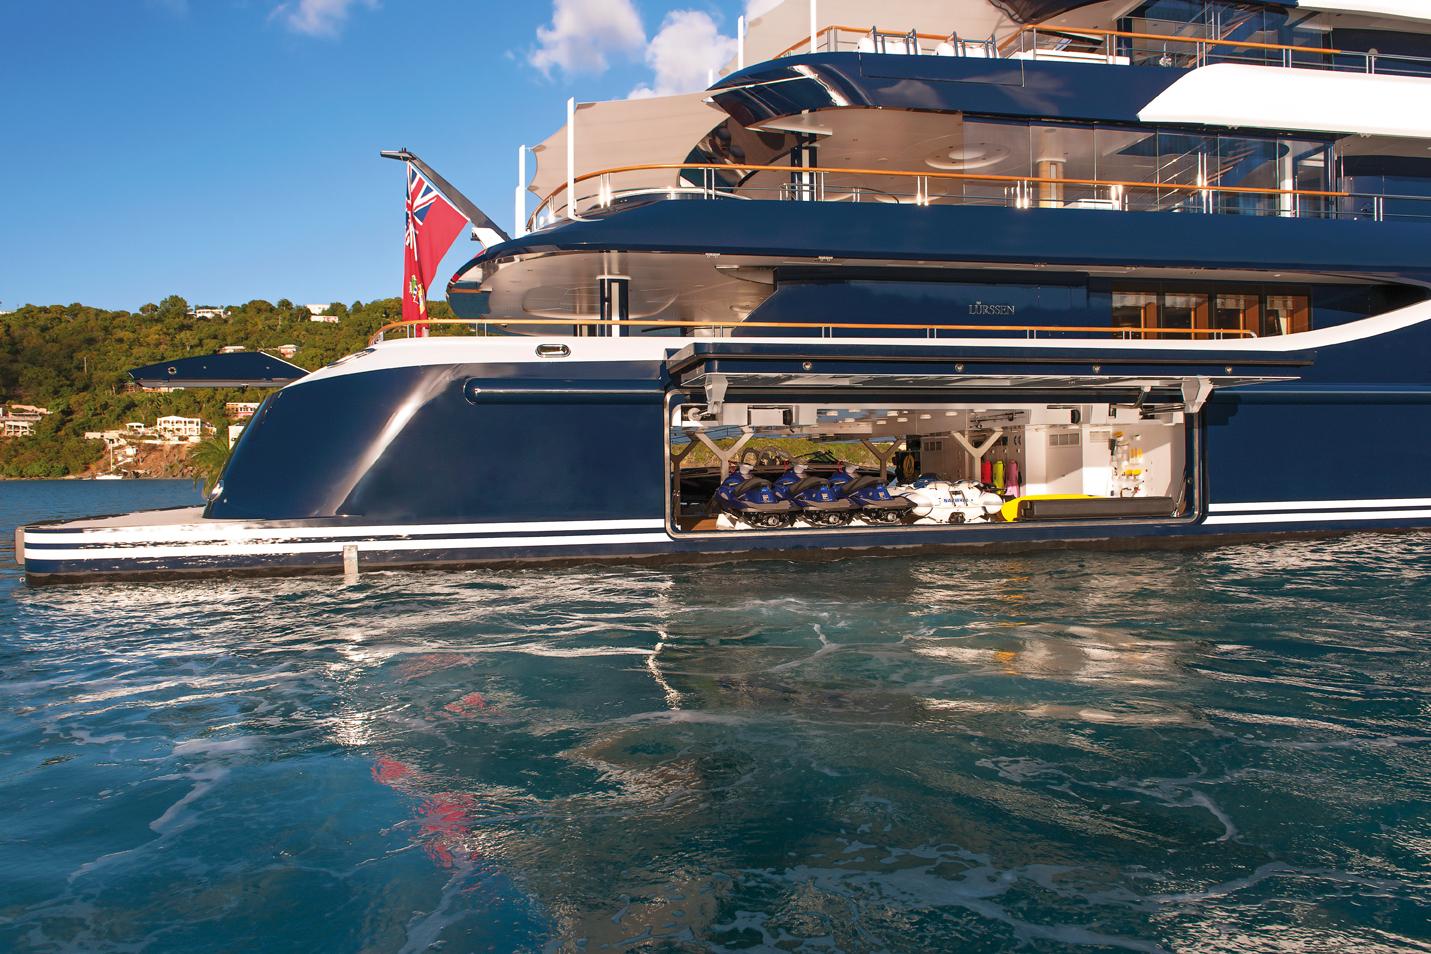 Yacht Solandge - Water Toys Etc